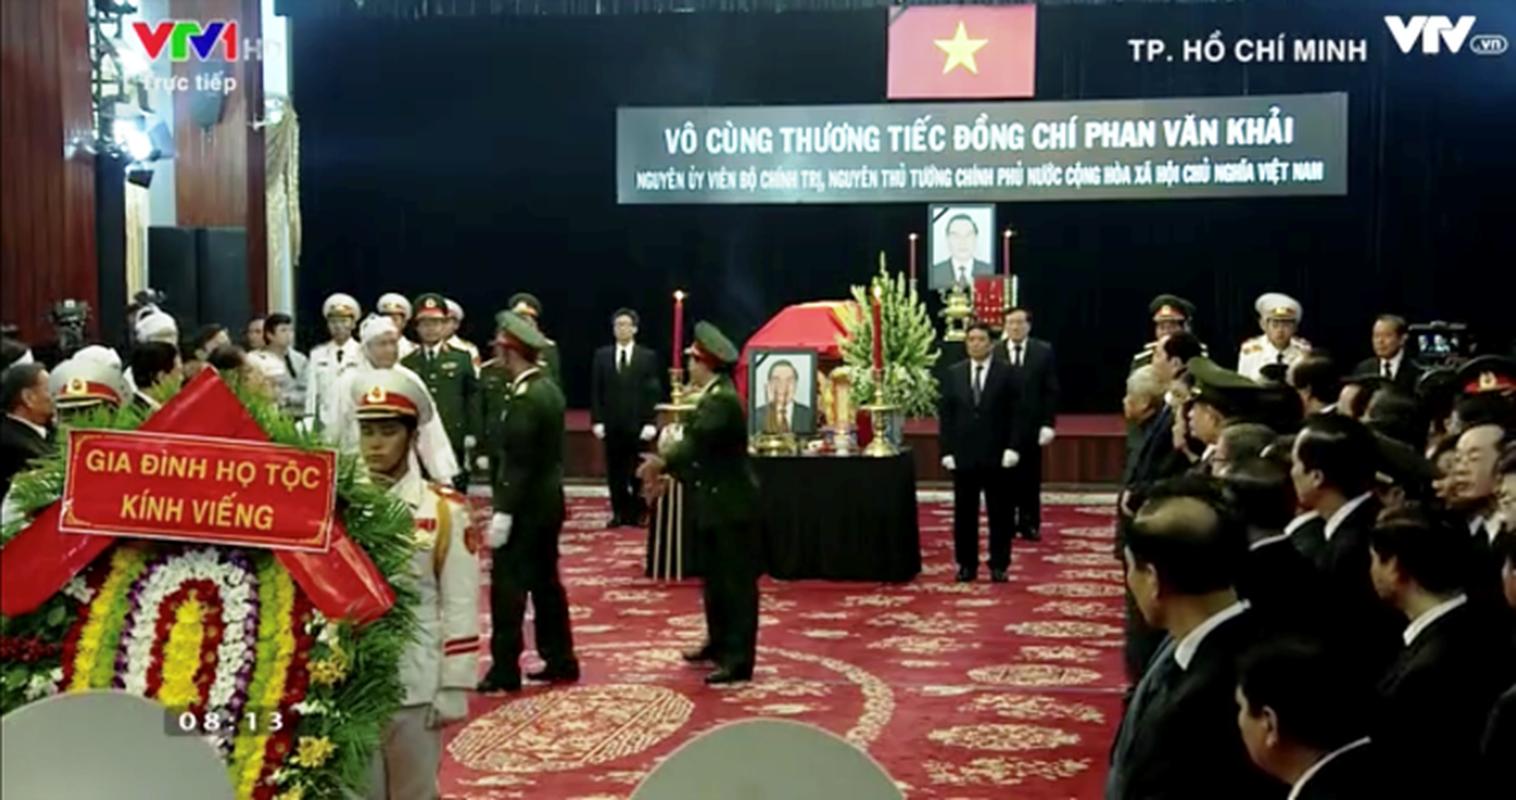 Bat dau le vieng nguyen Thu tuong Phan Van Khai o Hoi truong Thong Nhat-Hinh-6